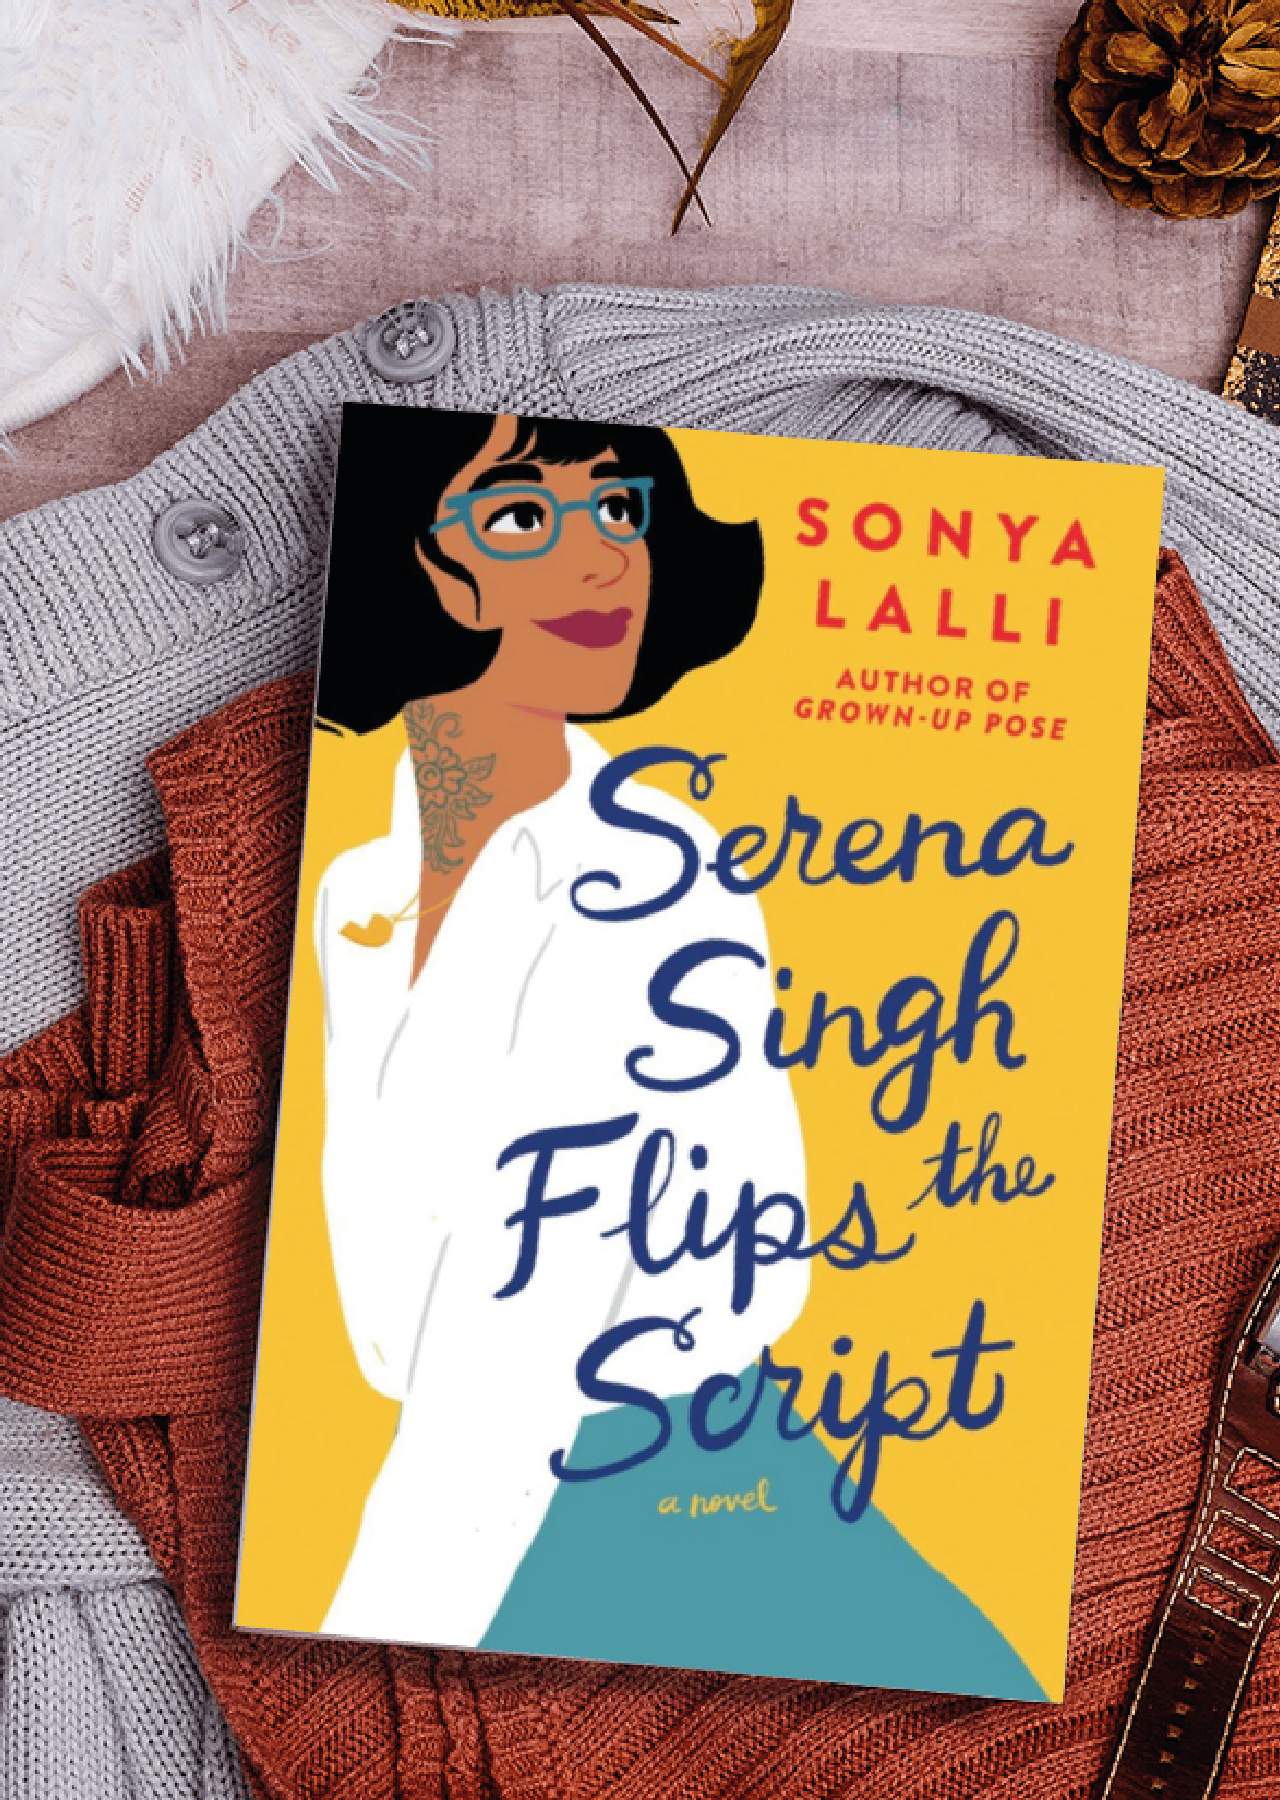 Serena Singh Flips the Script by Sonya Lalli